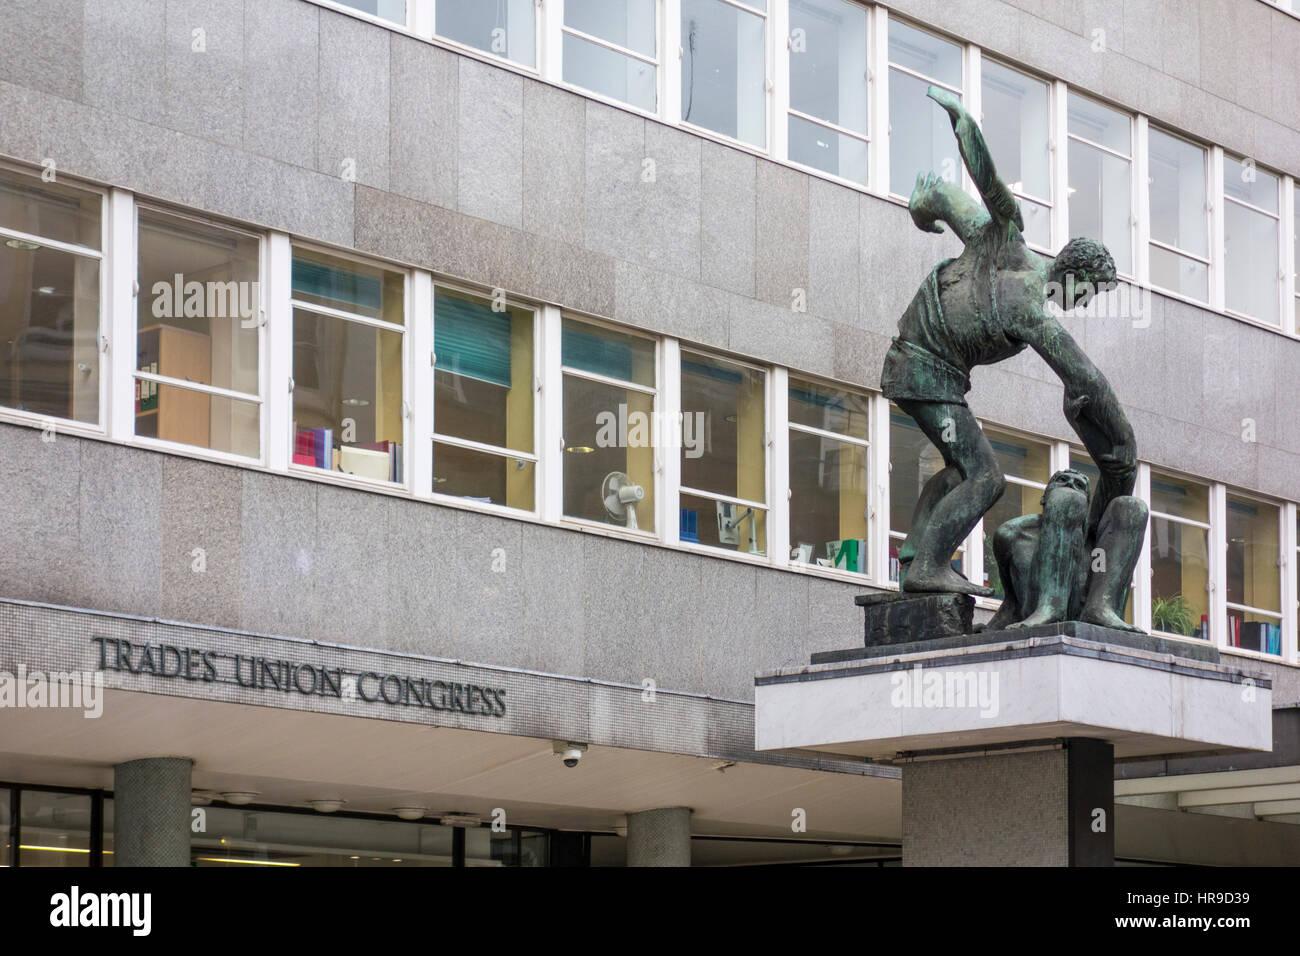 TUC, Trades Union Congress Building, Londres, Reino Unido Imagen De Stock